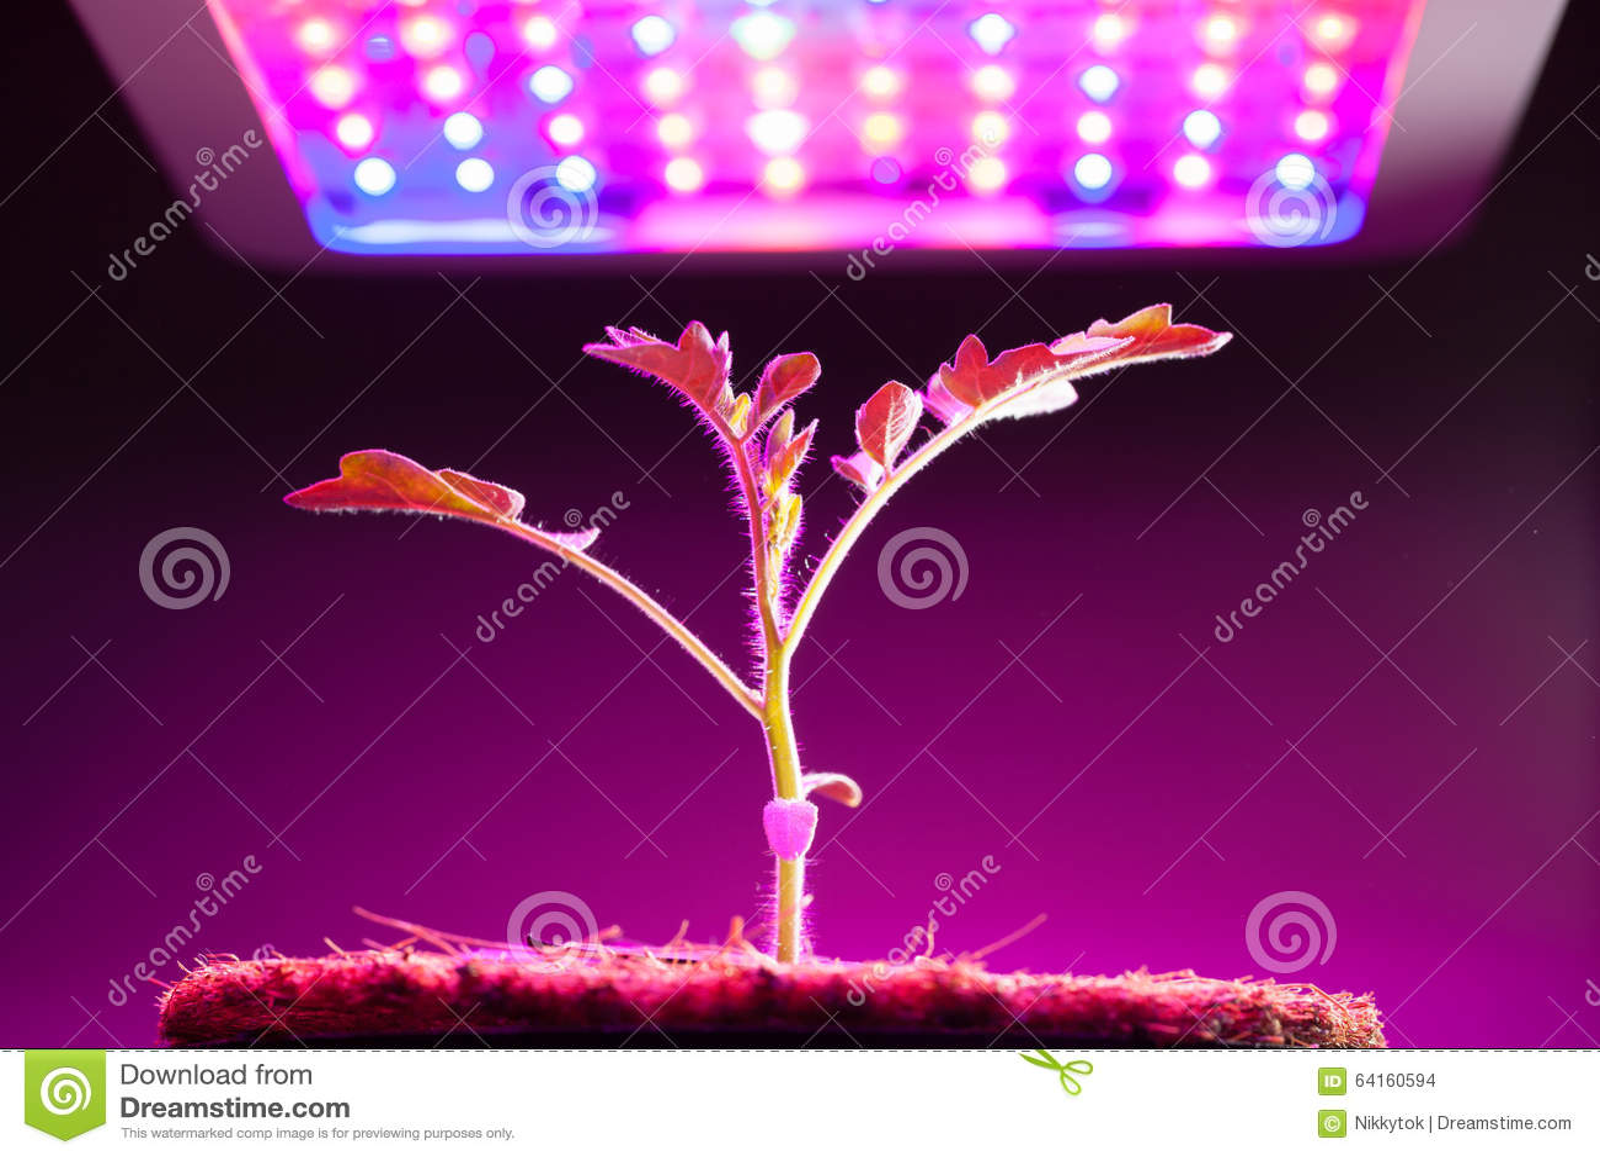 Young Tomato Plant Under Led Grow Light Stock Photo Image